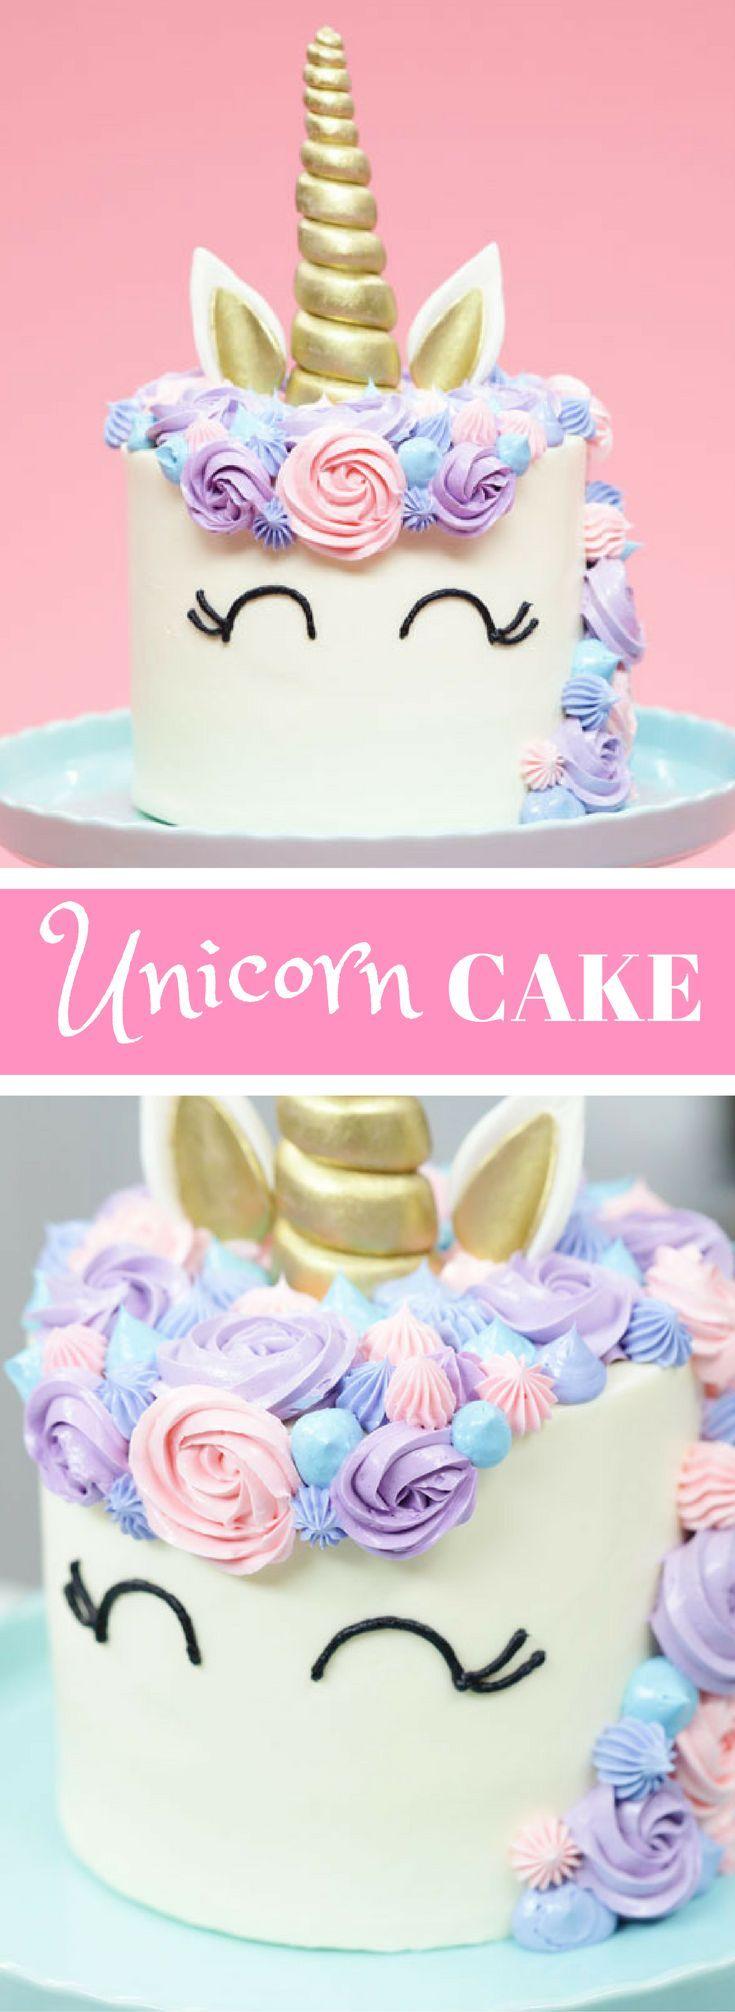 An easy funfetti Unicorn Cake recipe adorned in pastel buttercream